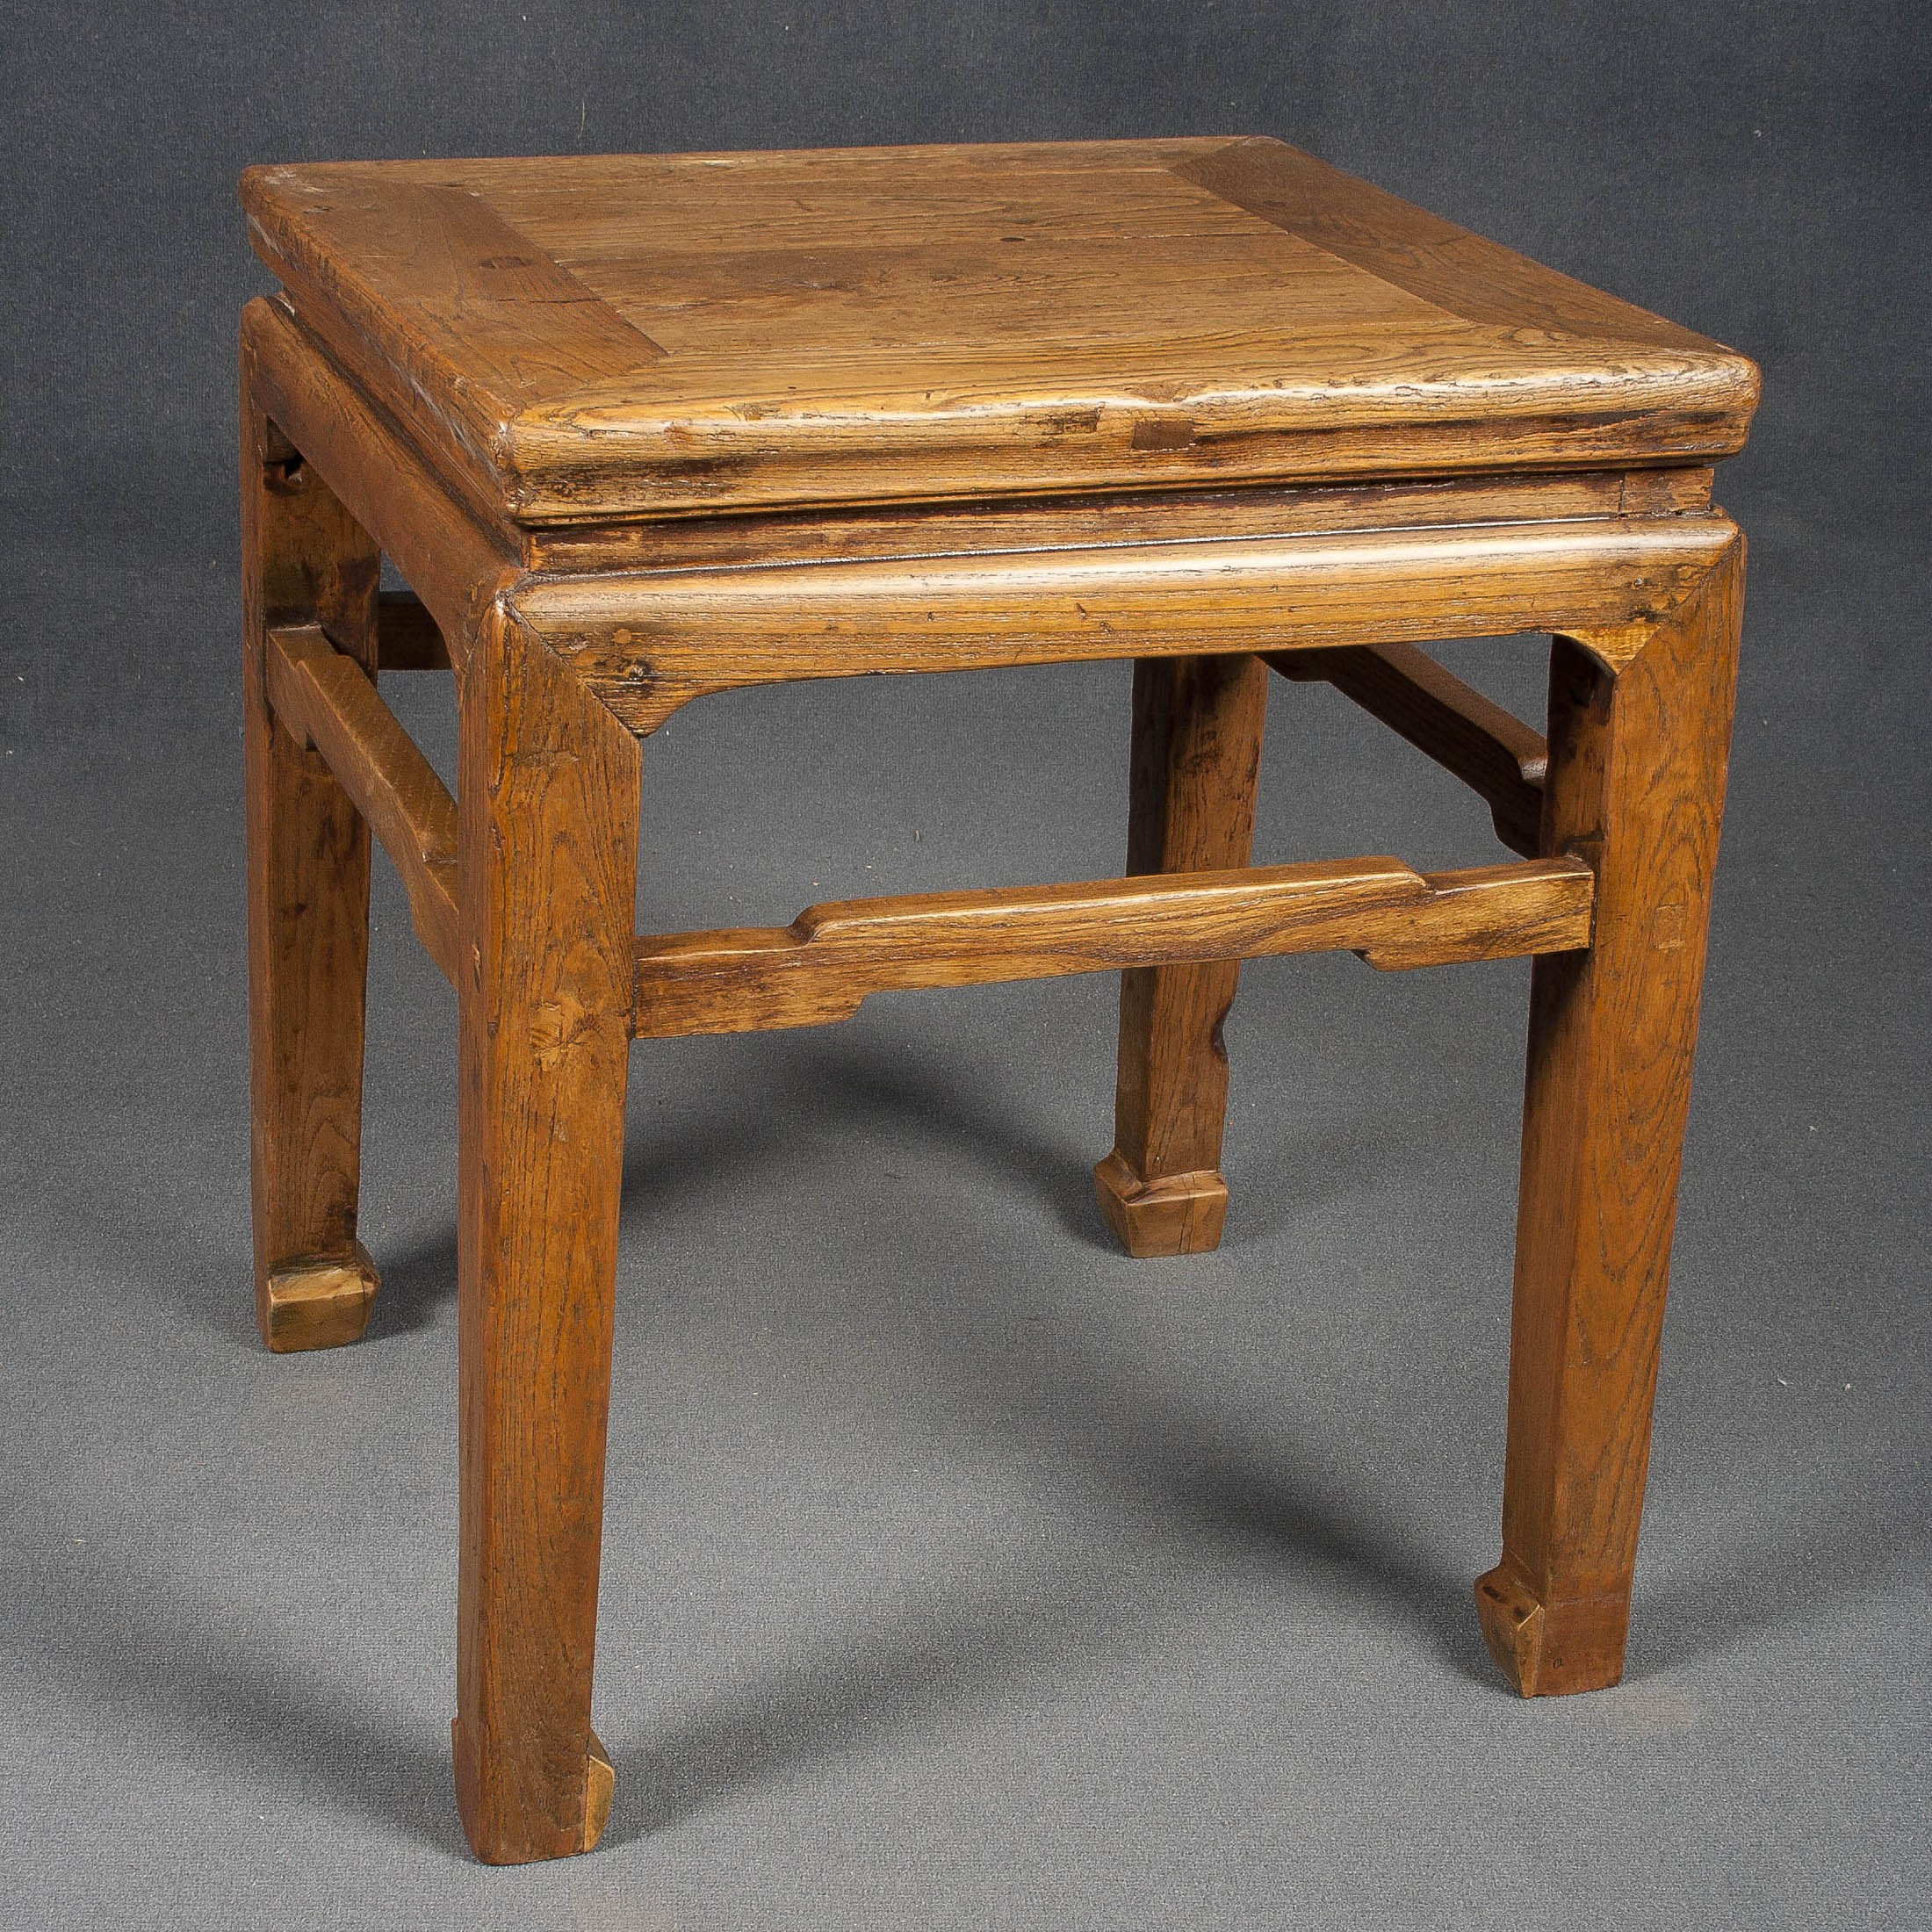 Taburete y taburete de madera batavia - Taburete de madera ...